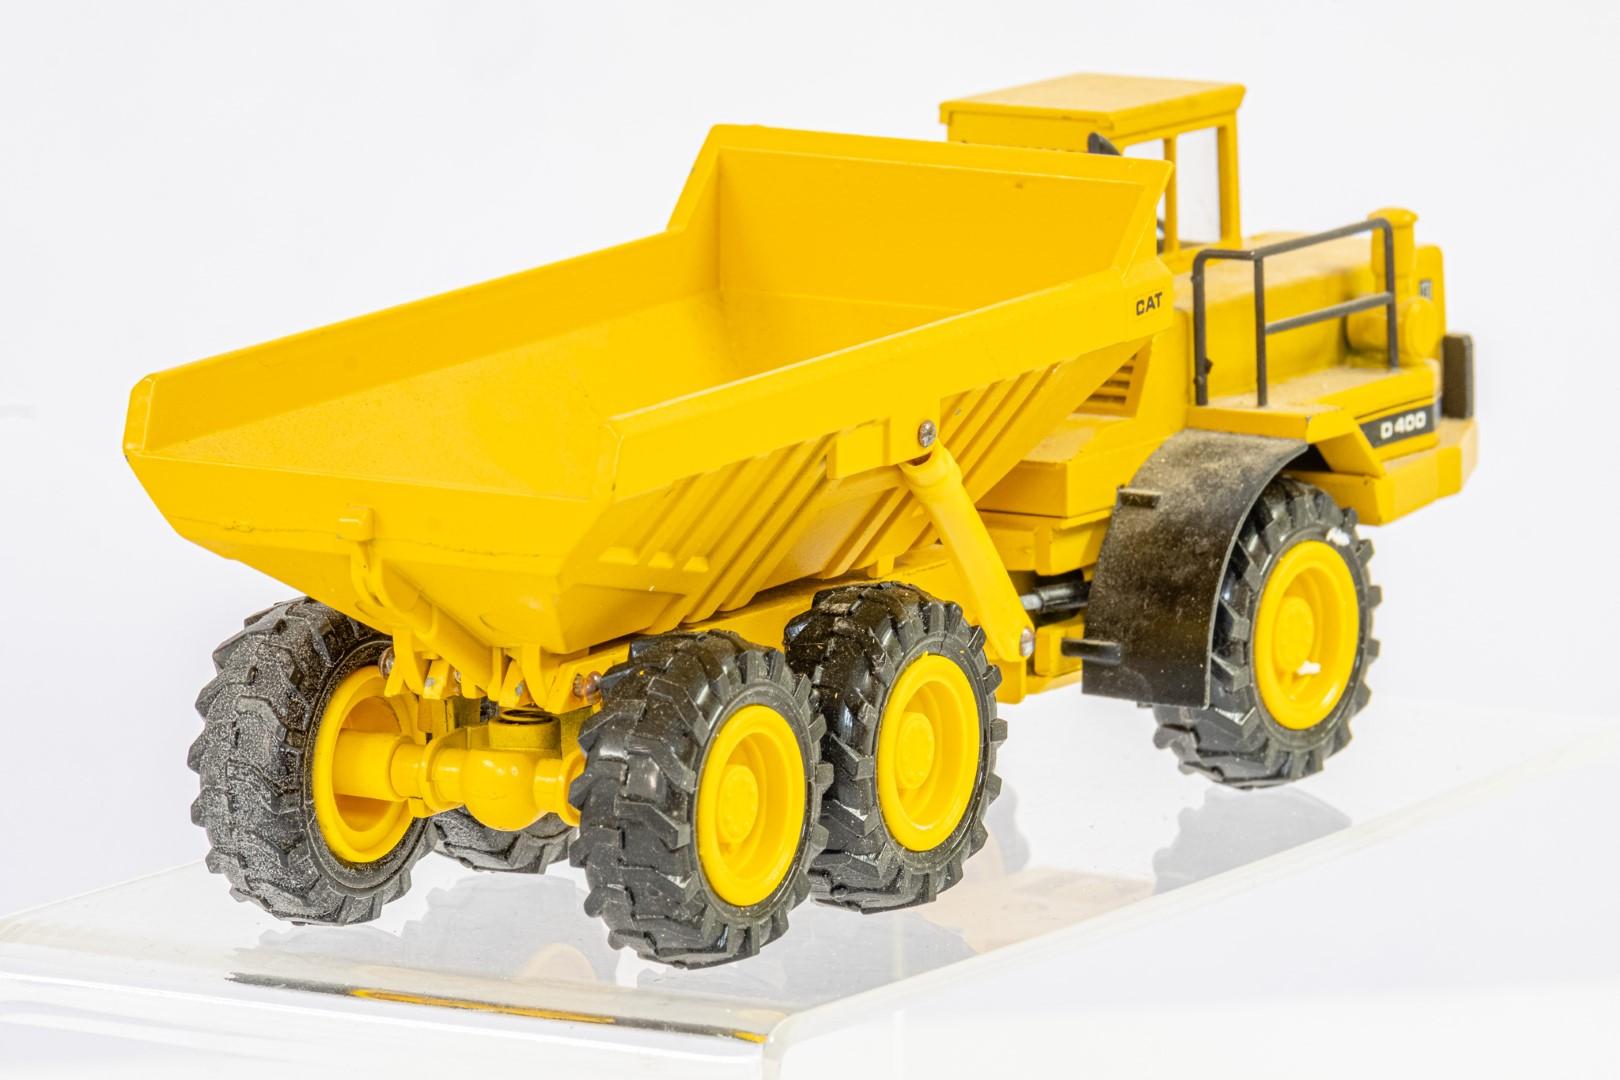 Conrad CAT D400 Articulated Dump Truck - Image 3 of 3